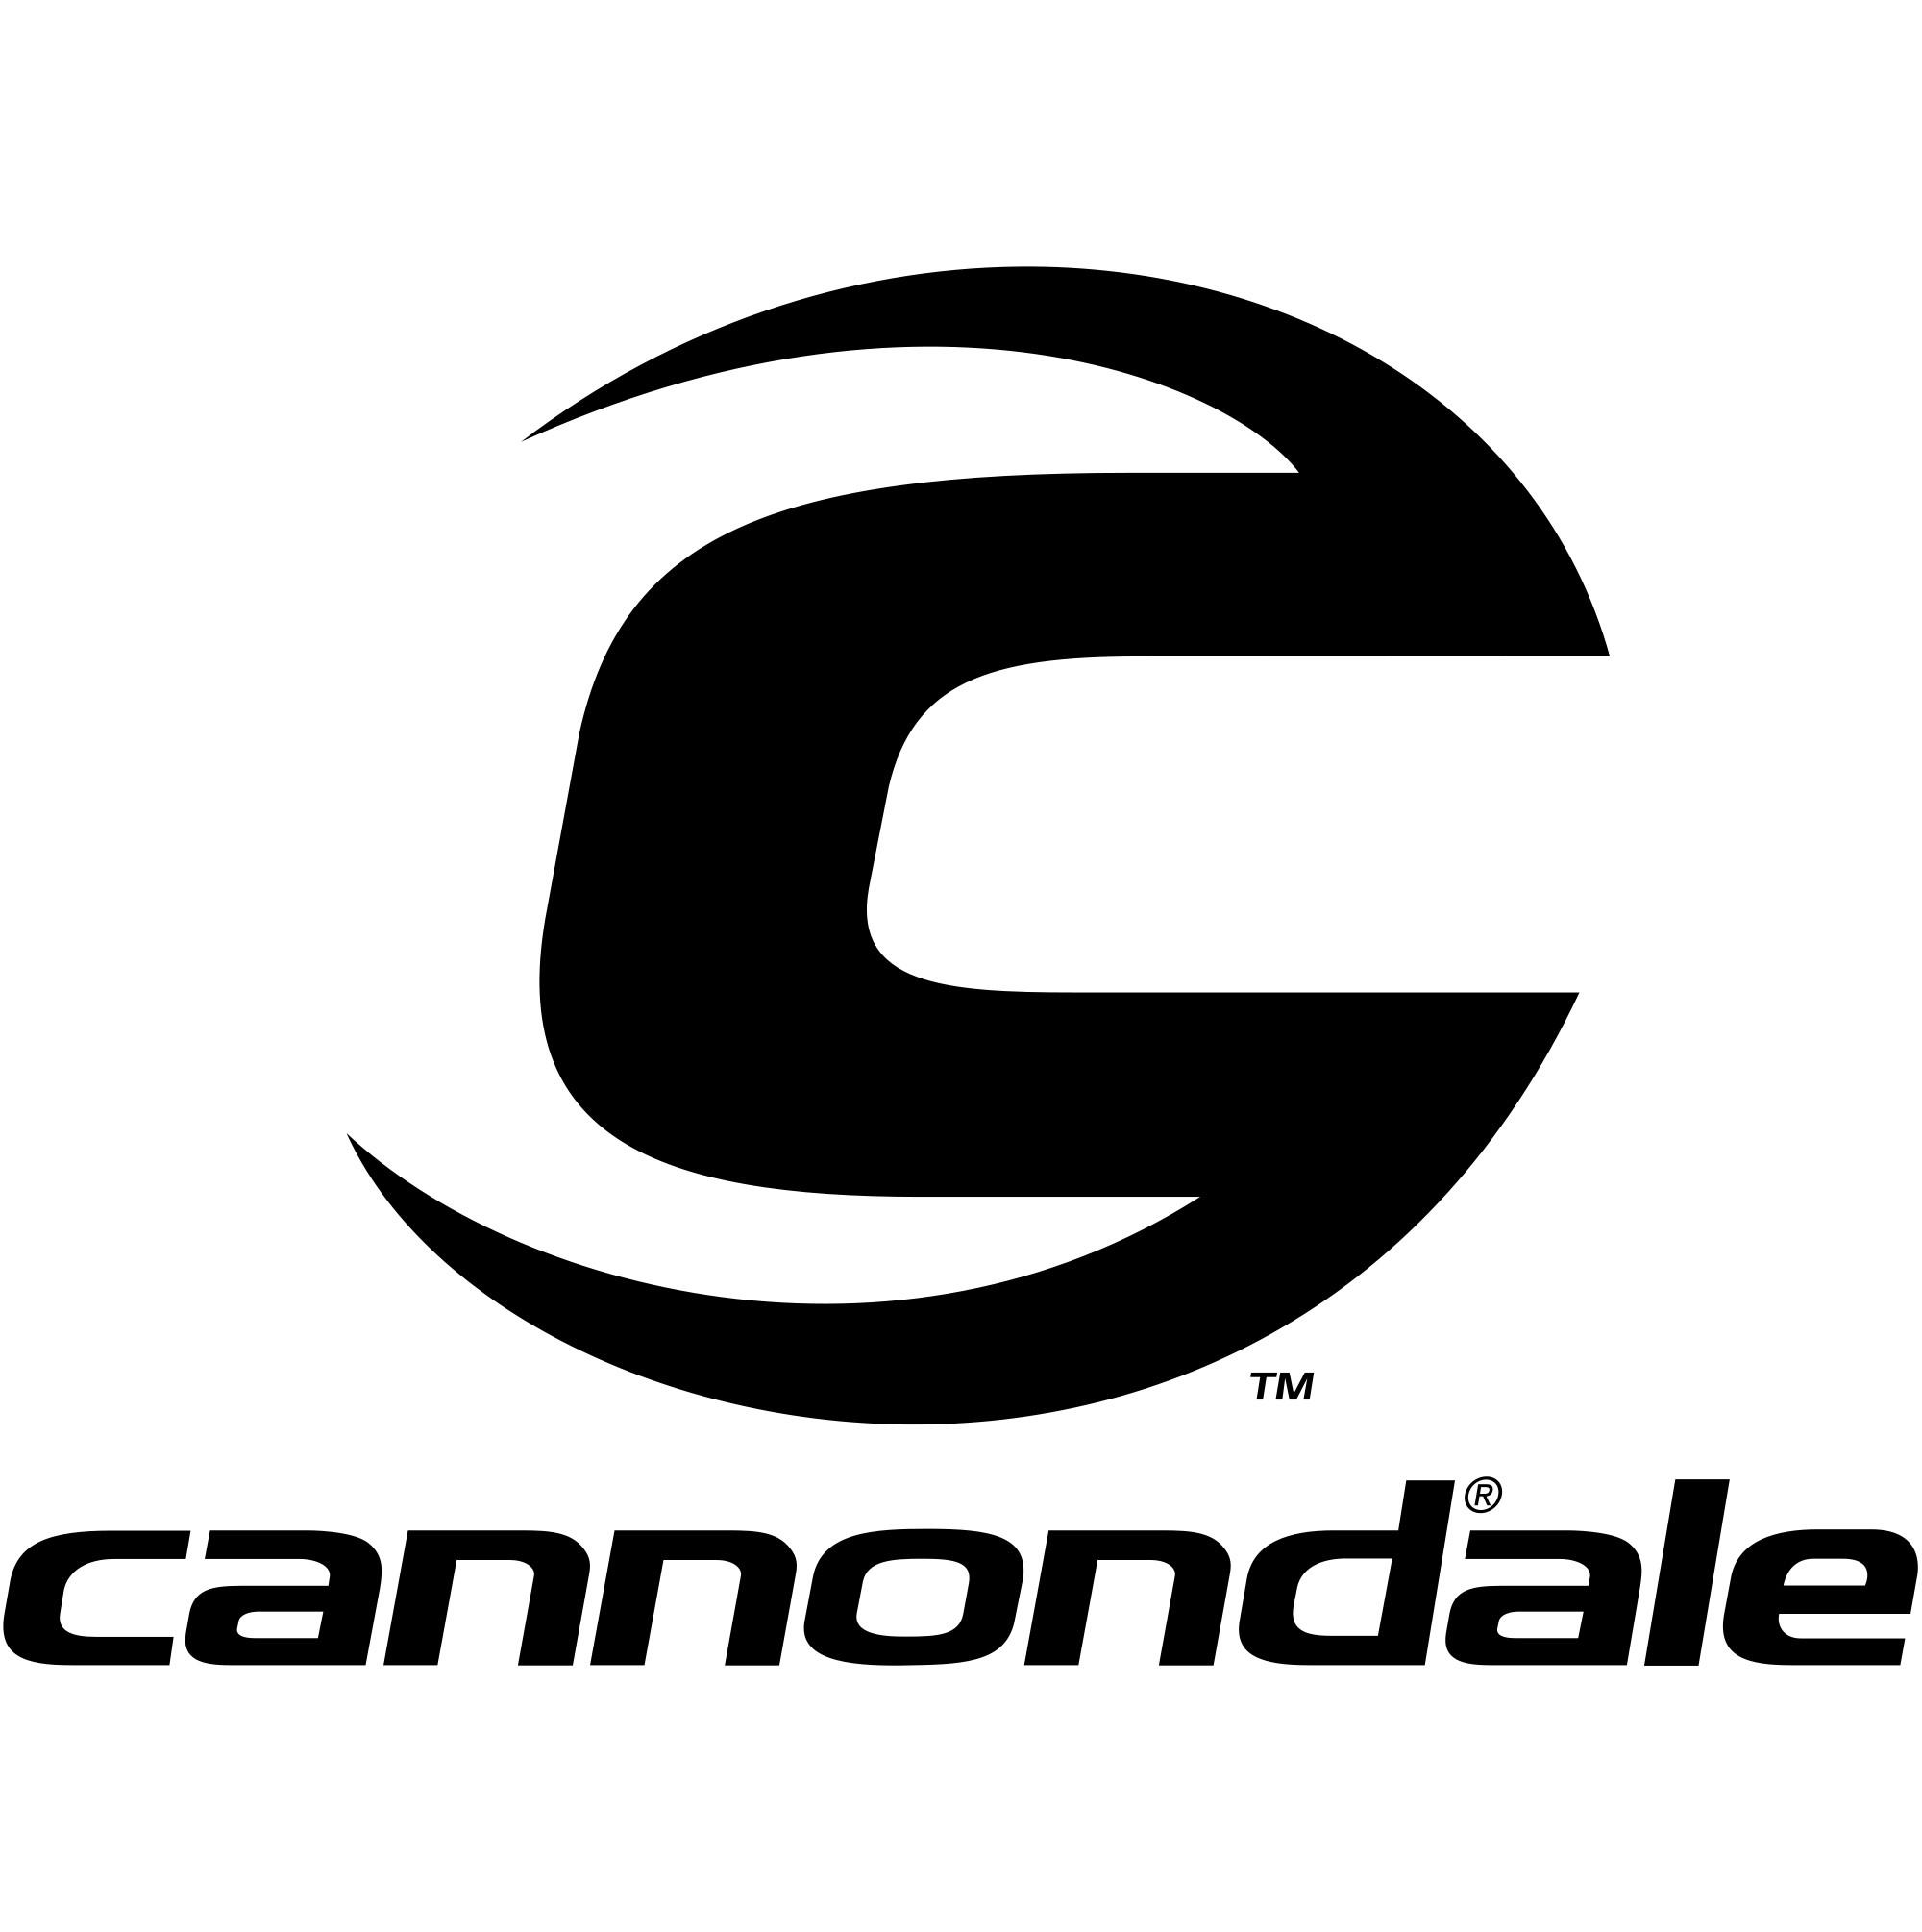 cannondale logo.jpg